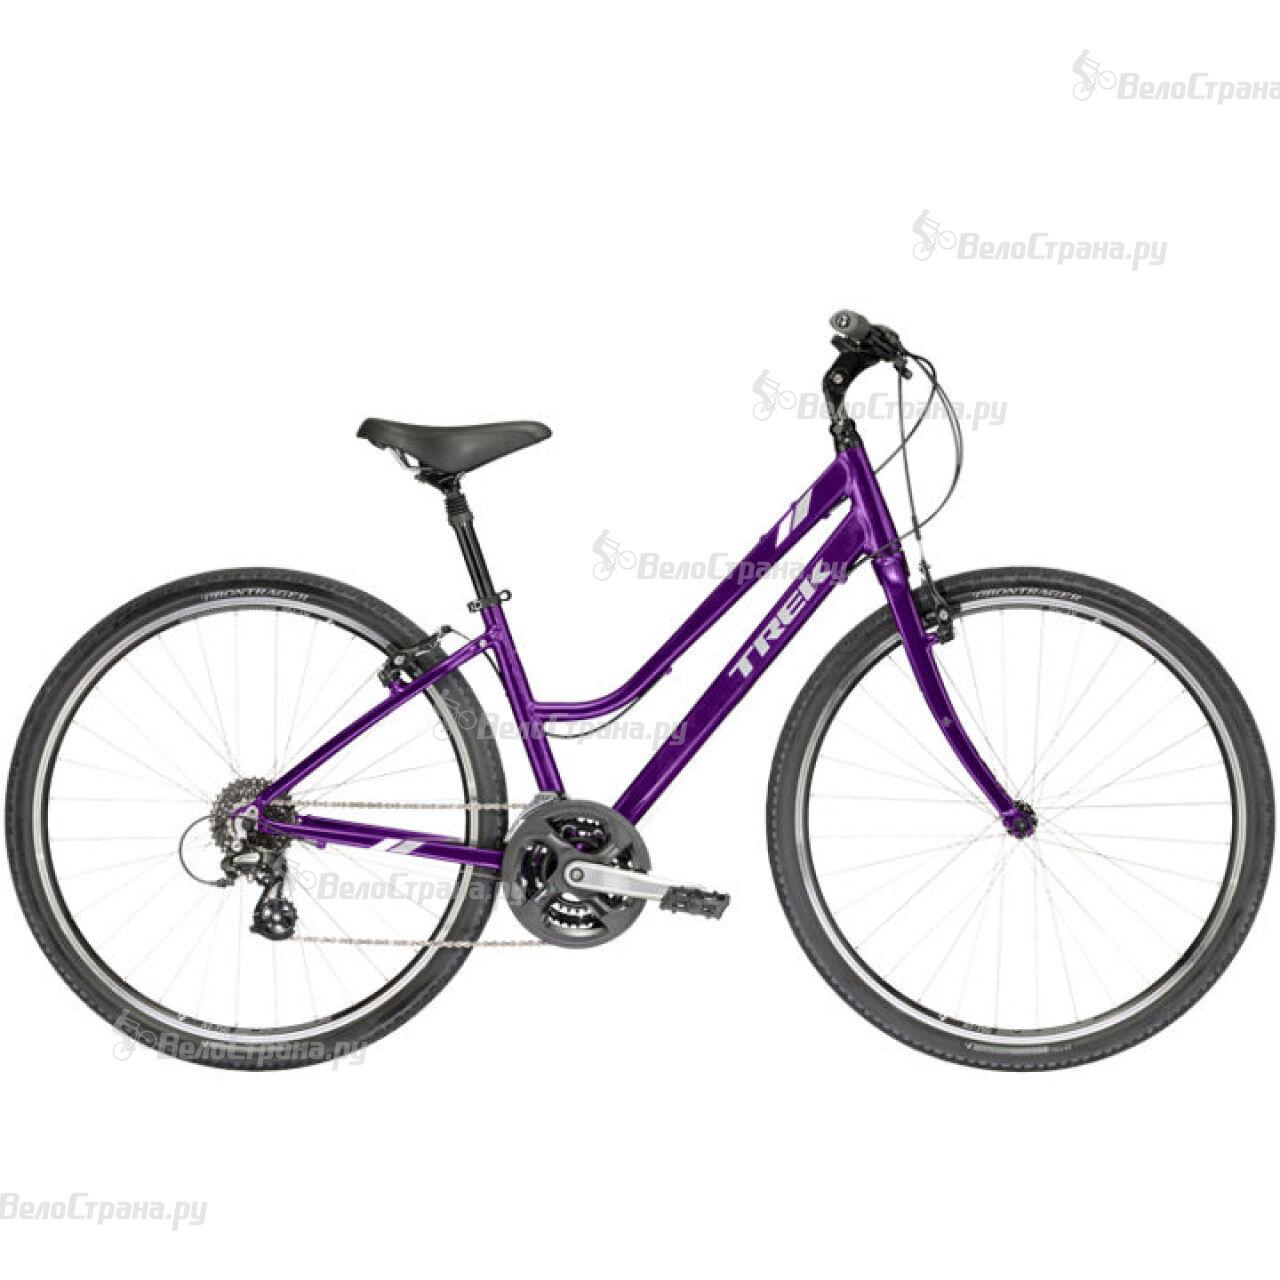 Велосипед Trek Verve 2 WSD (2017) велосипед trek madone 3 1 wsd 2013